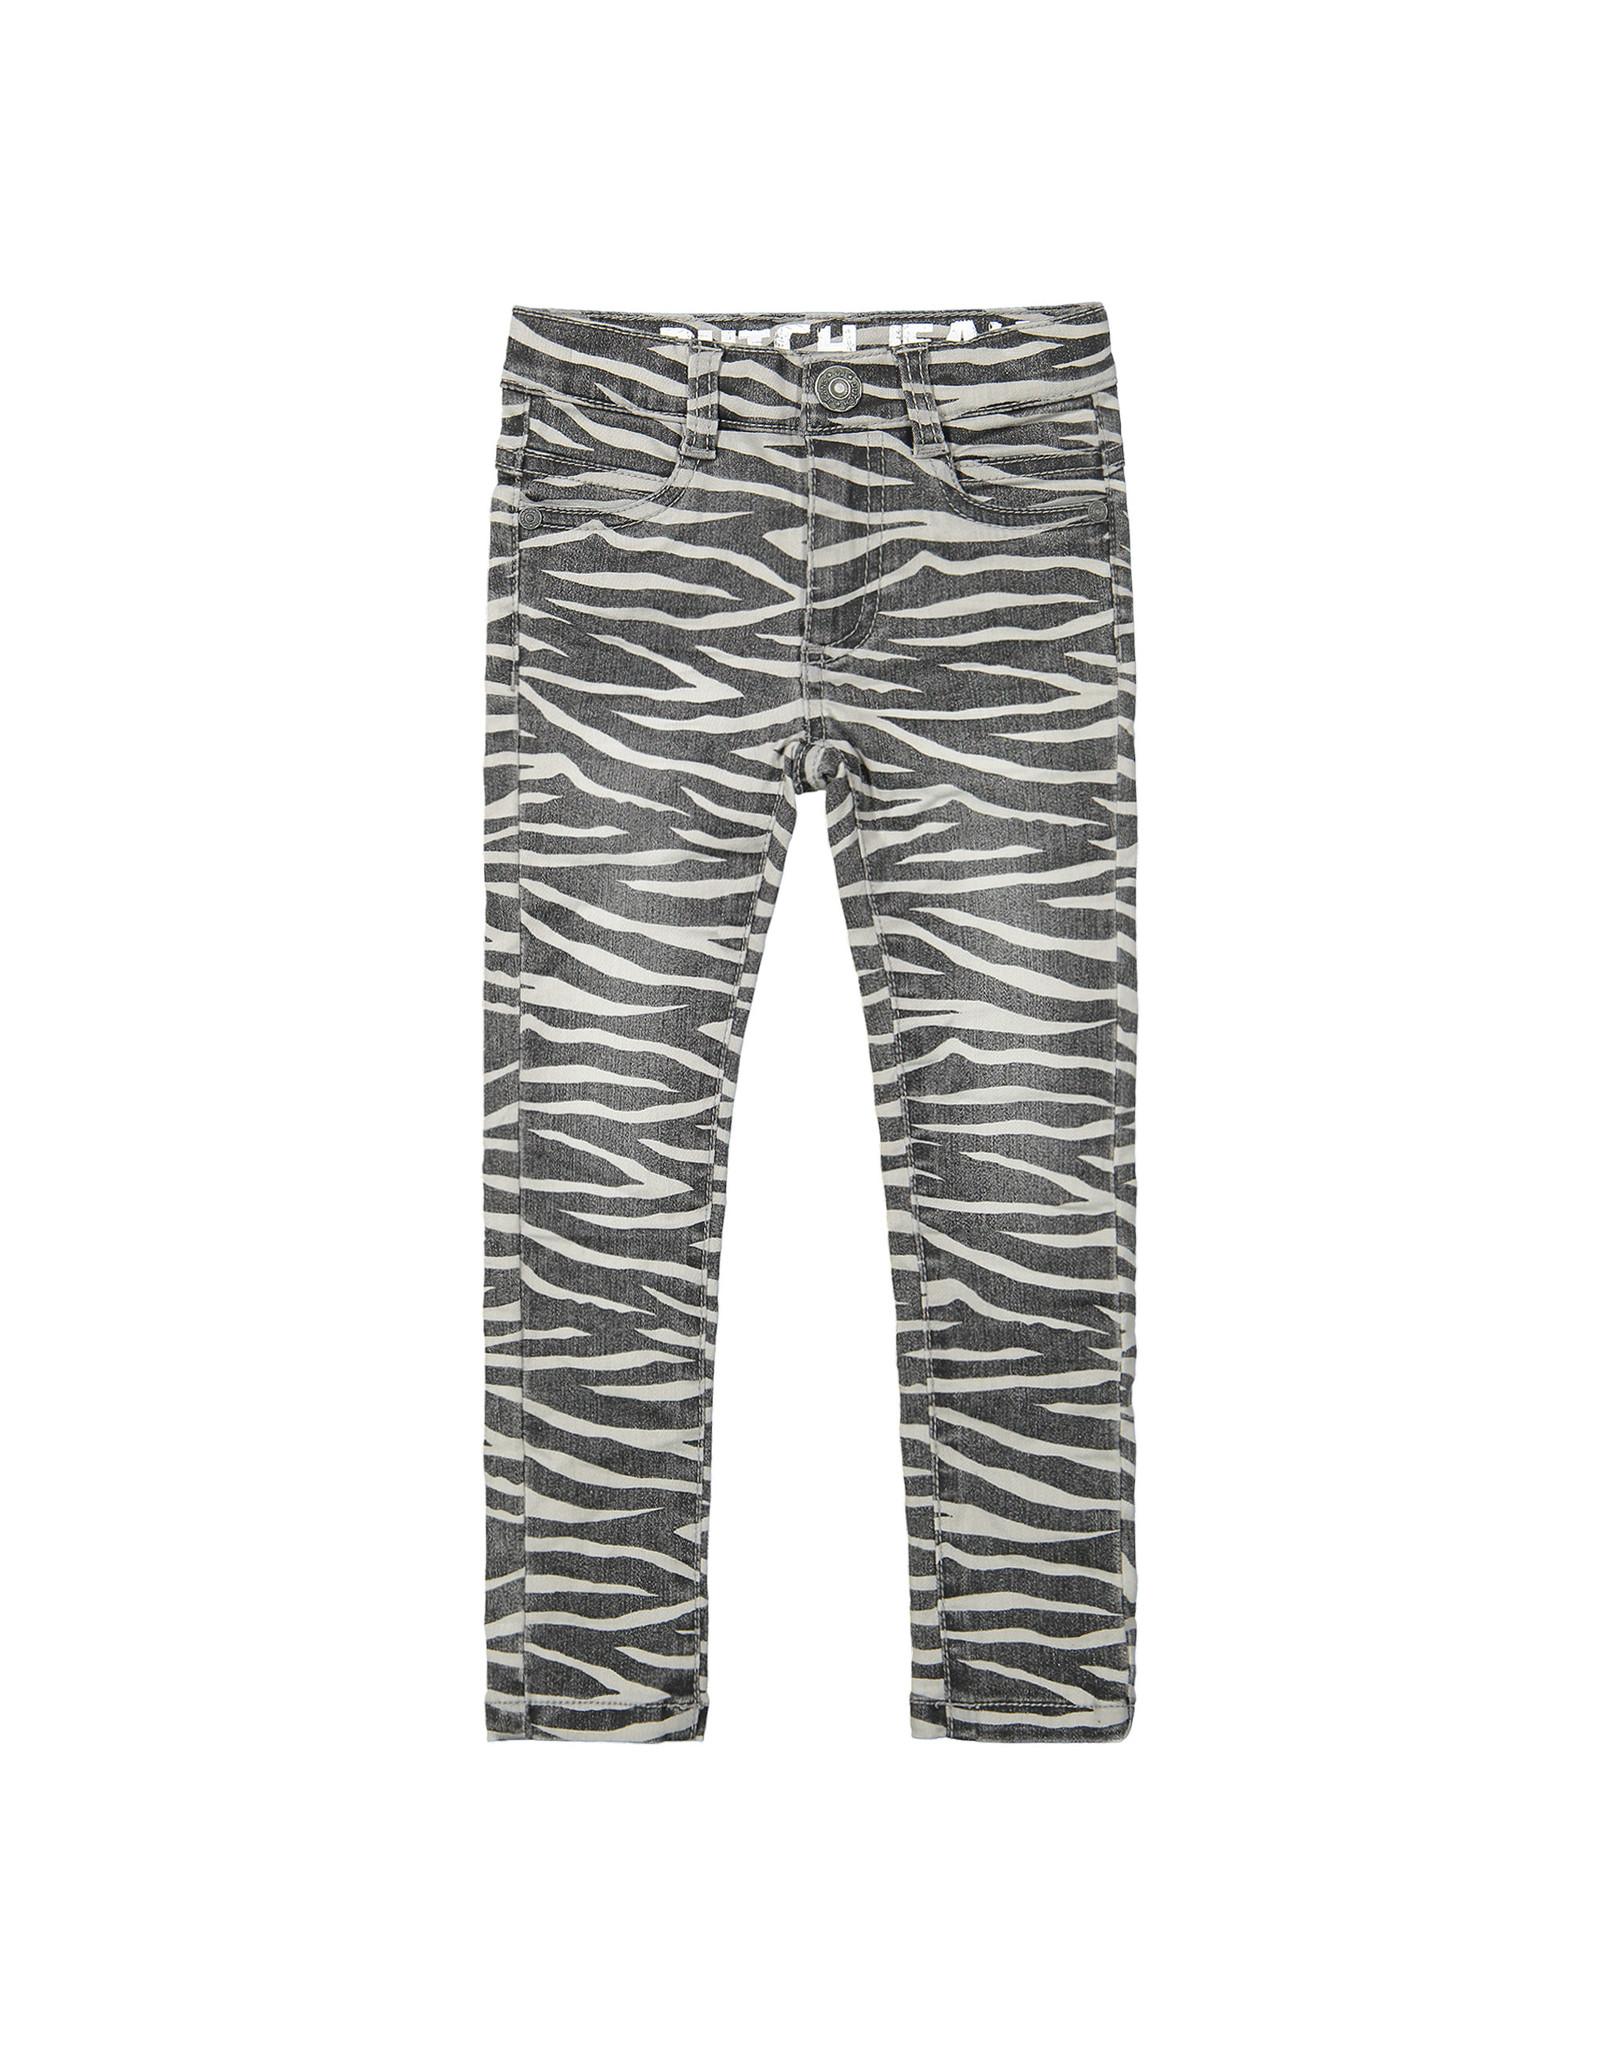 DJ Dutchjeans DJ Dutchjeans meisjes jeans Animalprint Grey